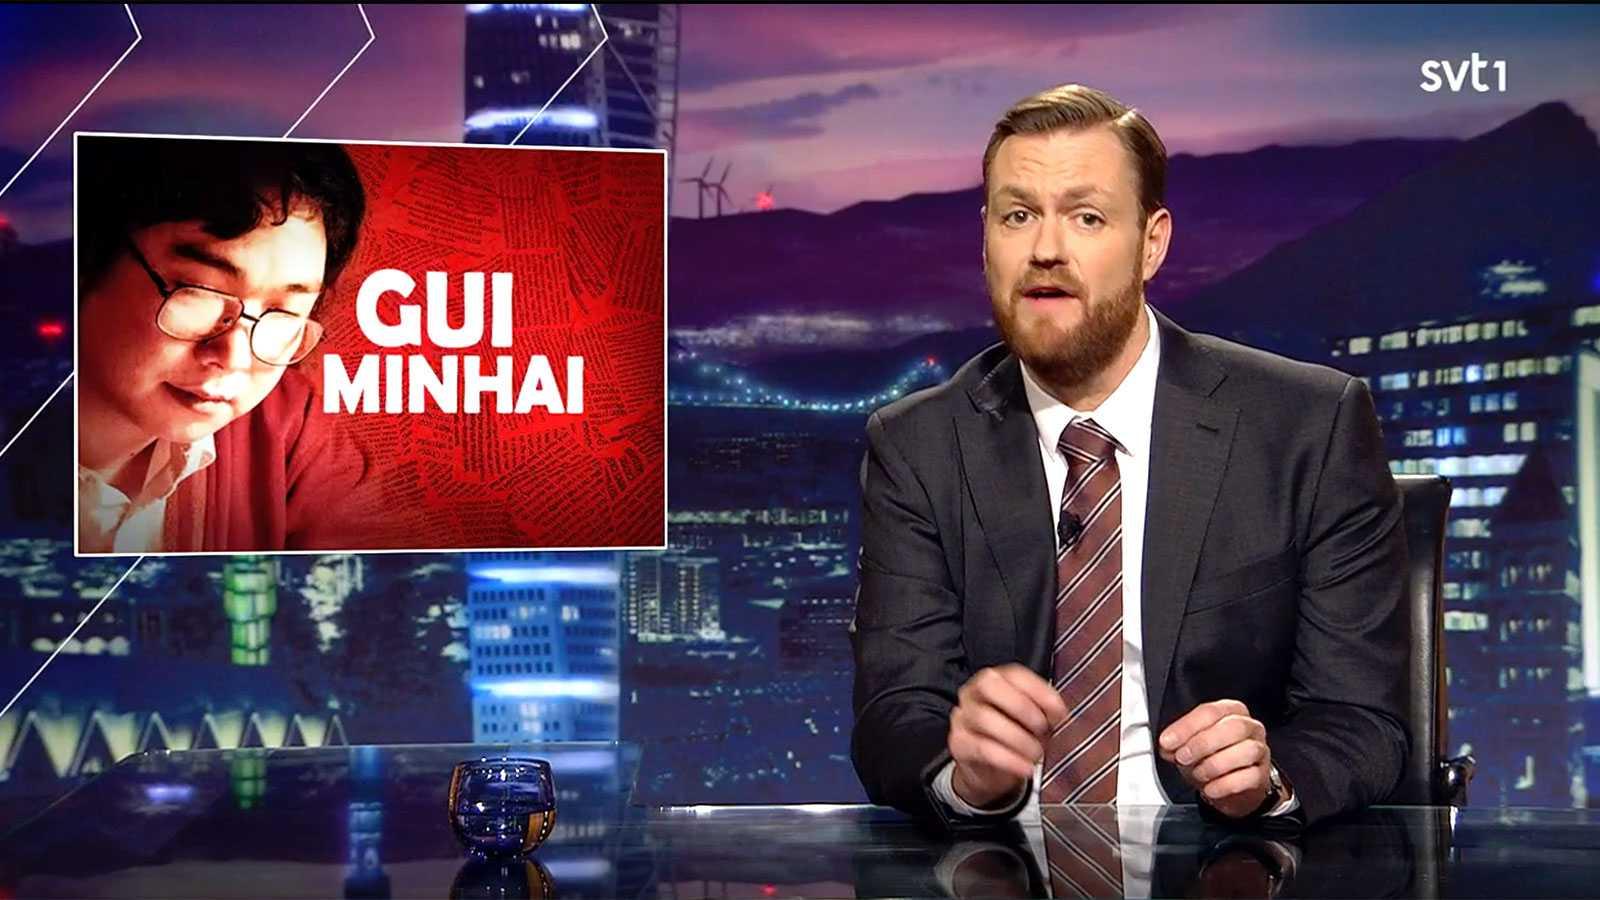 SVT-programmets nya Kina-diss: En liten lort